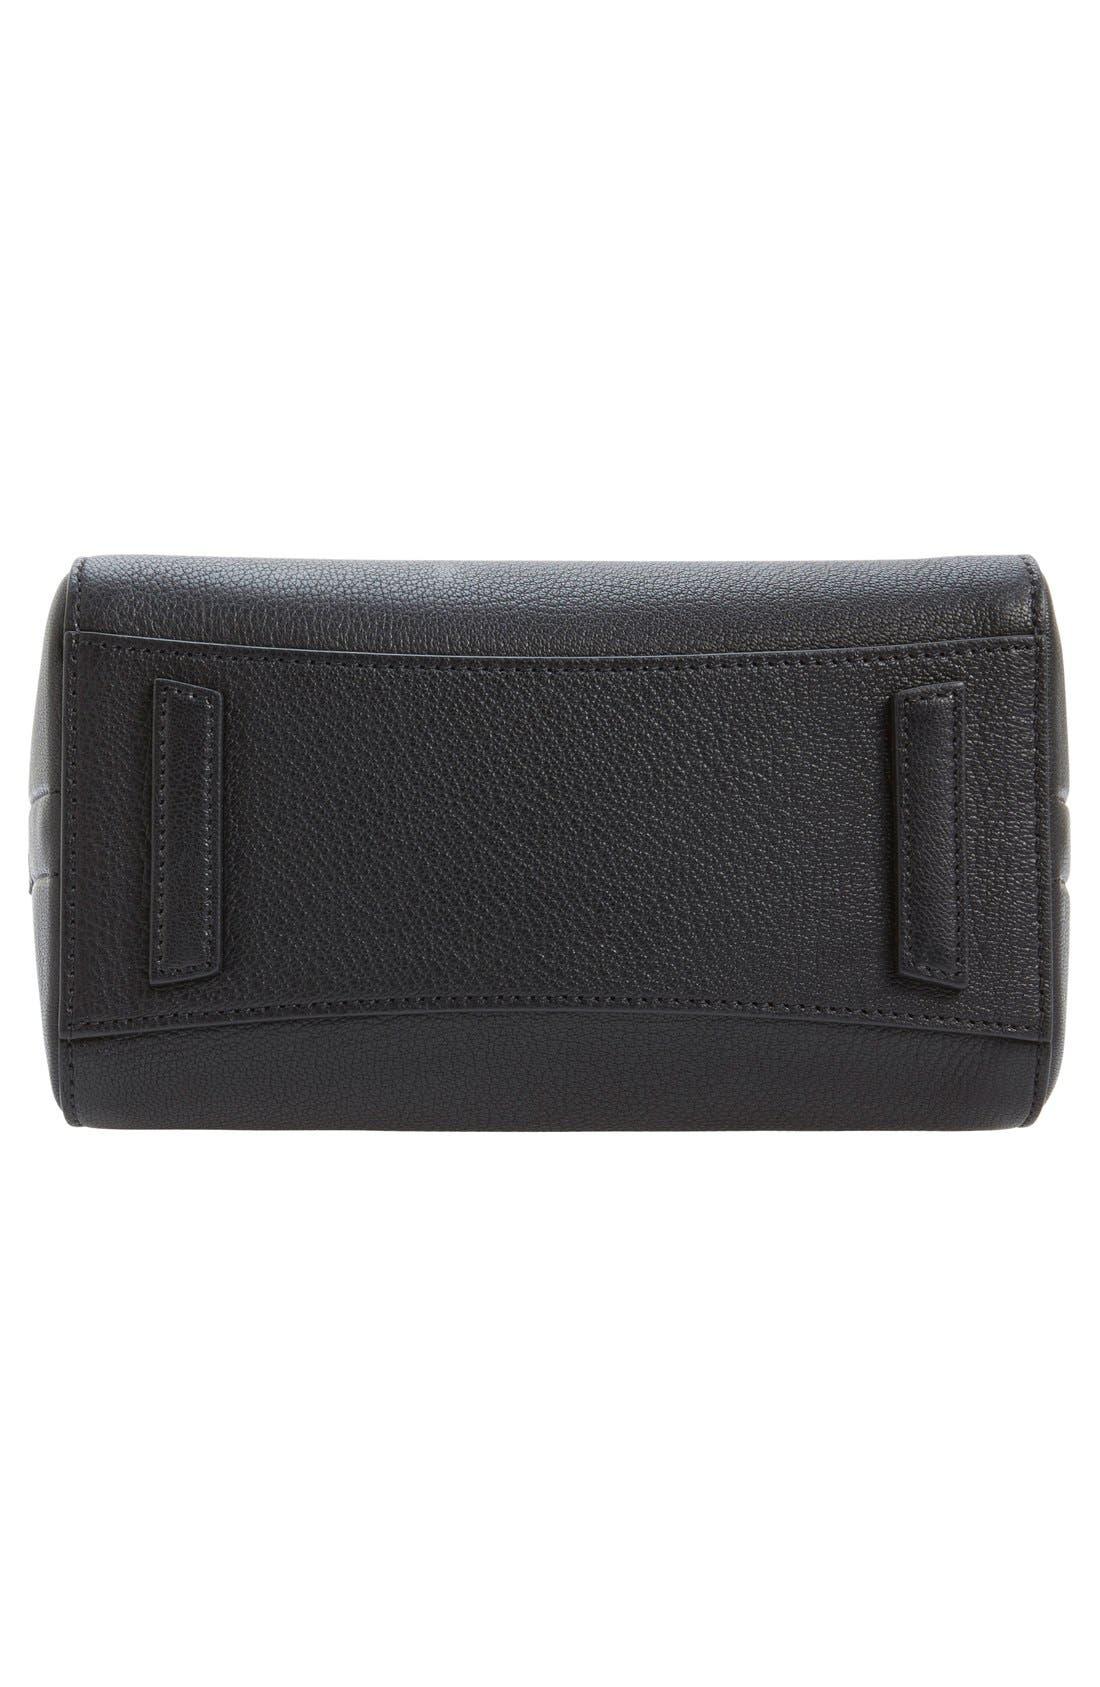 'Mini Antigona' Sugar Leather Satchel,                             Alternate thumbnail 8, color,                             BLACK